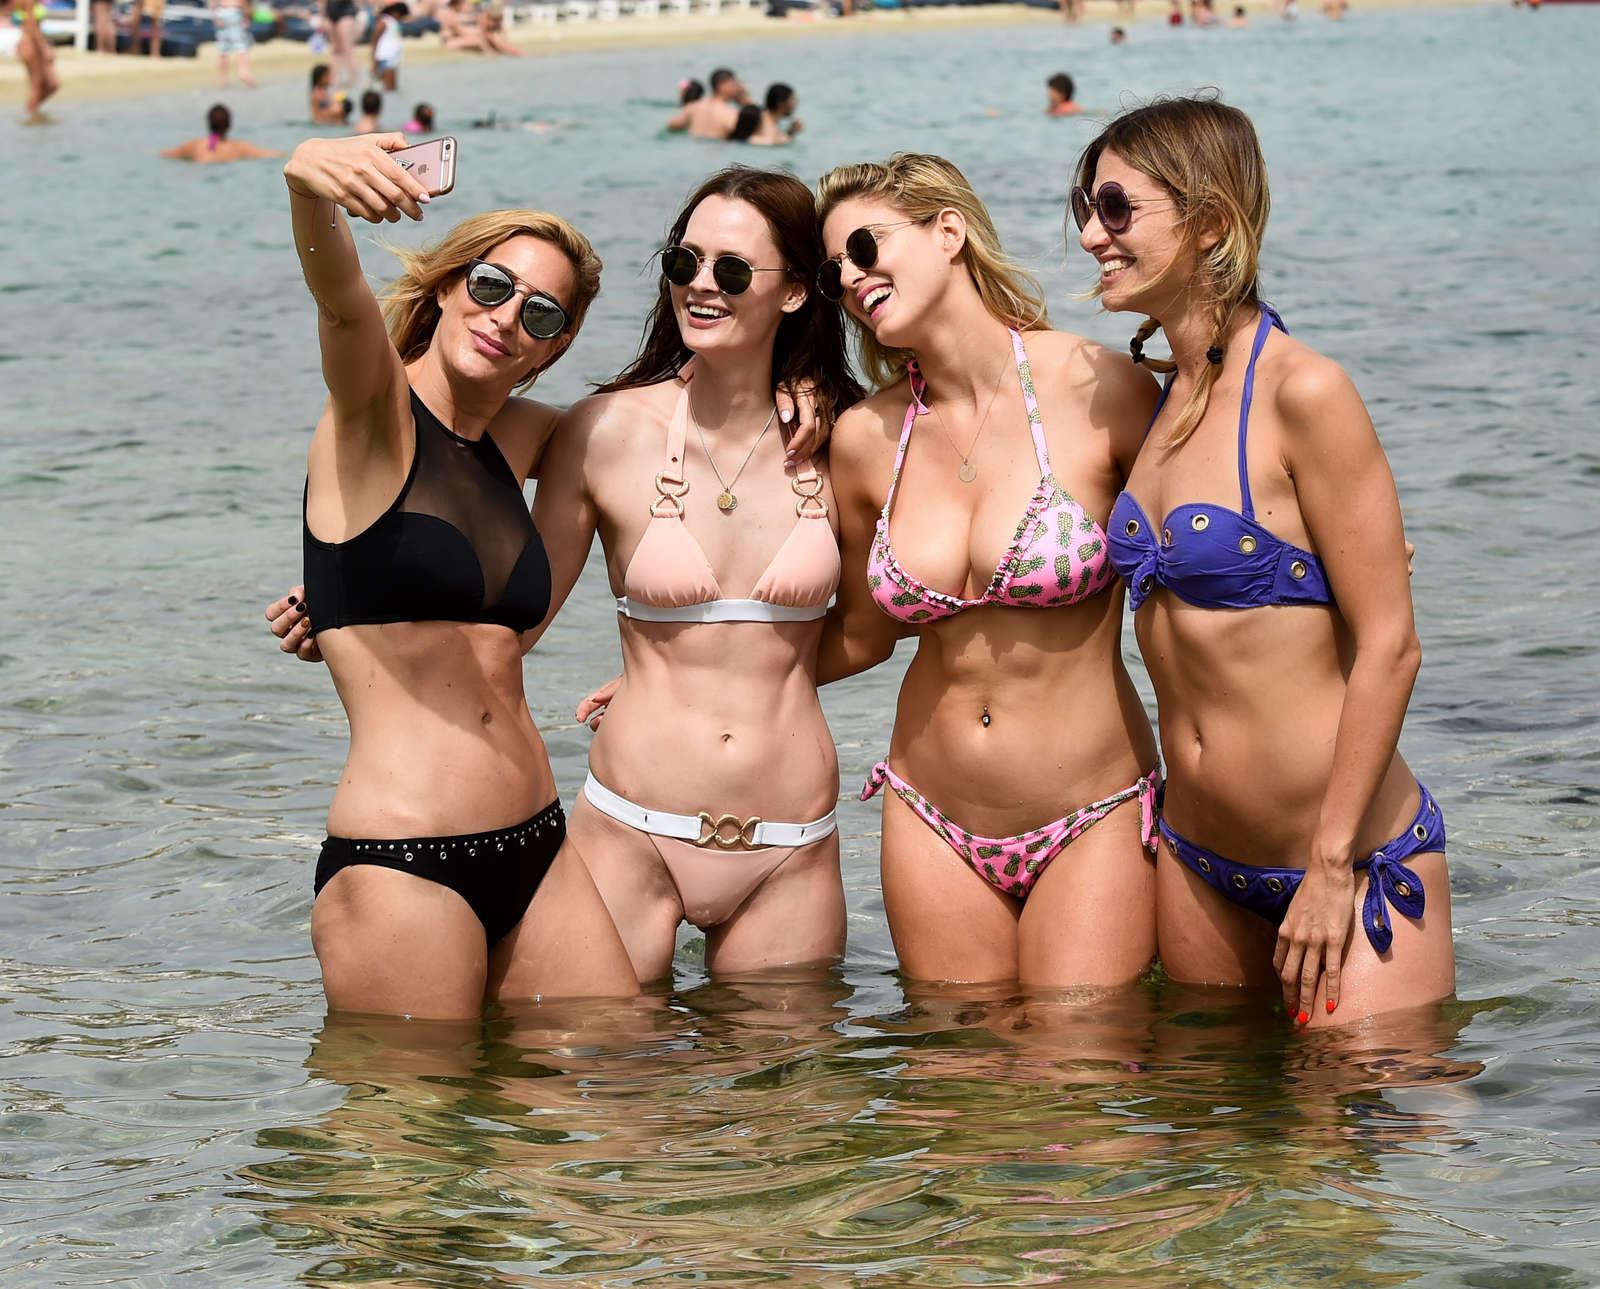 Ashley-James-in-Bikini-2016--08.jpg